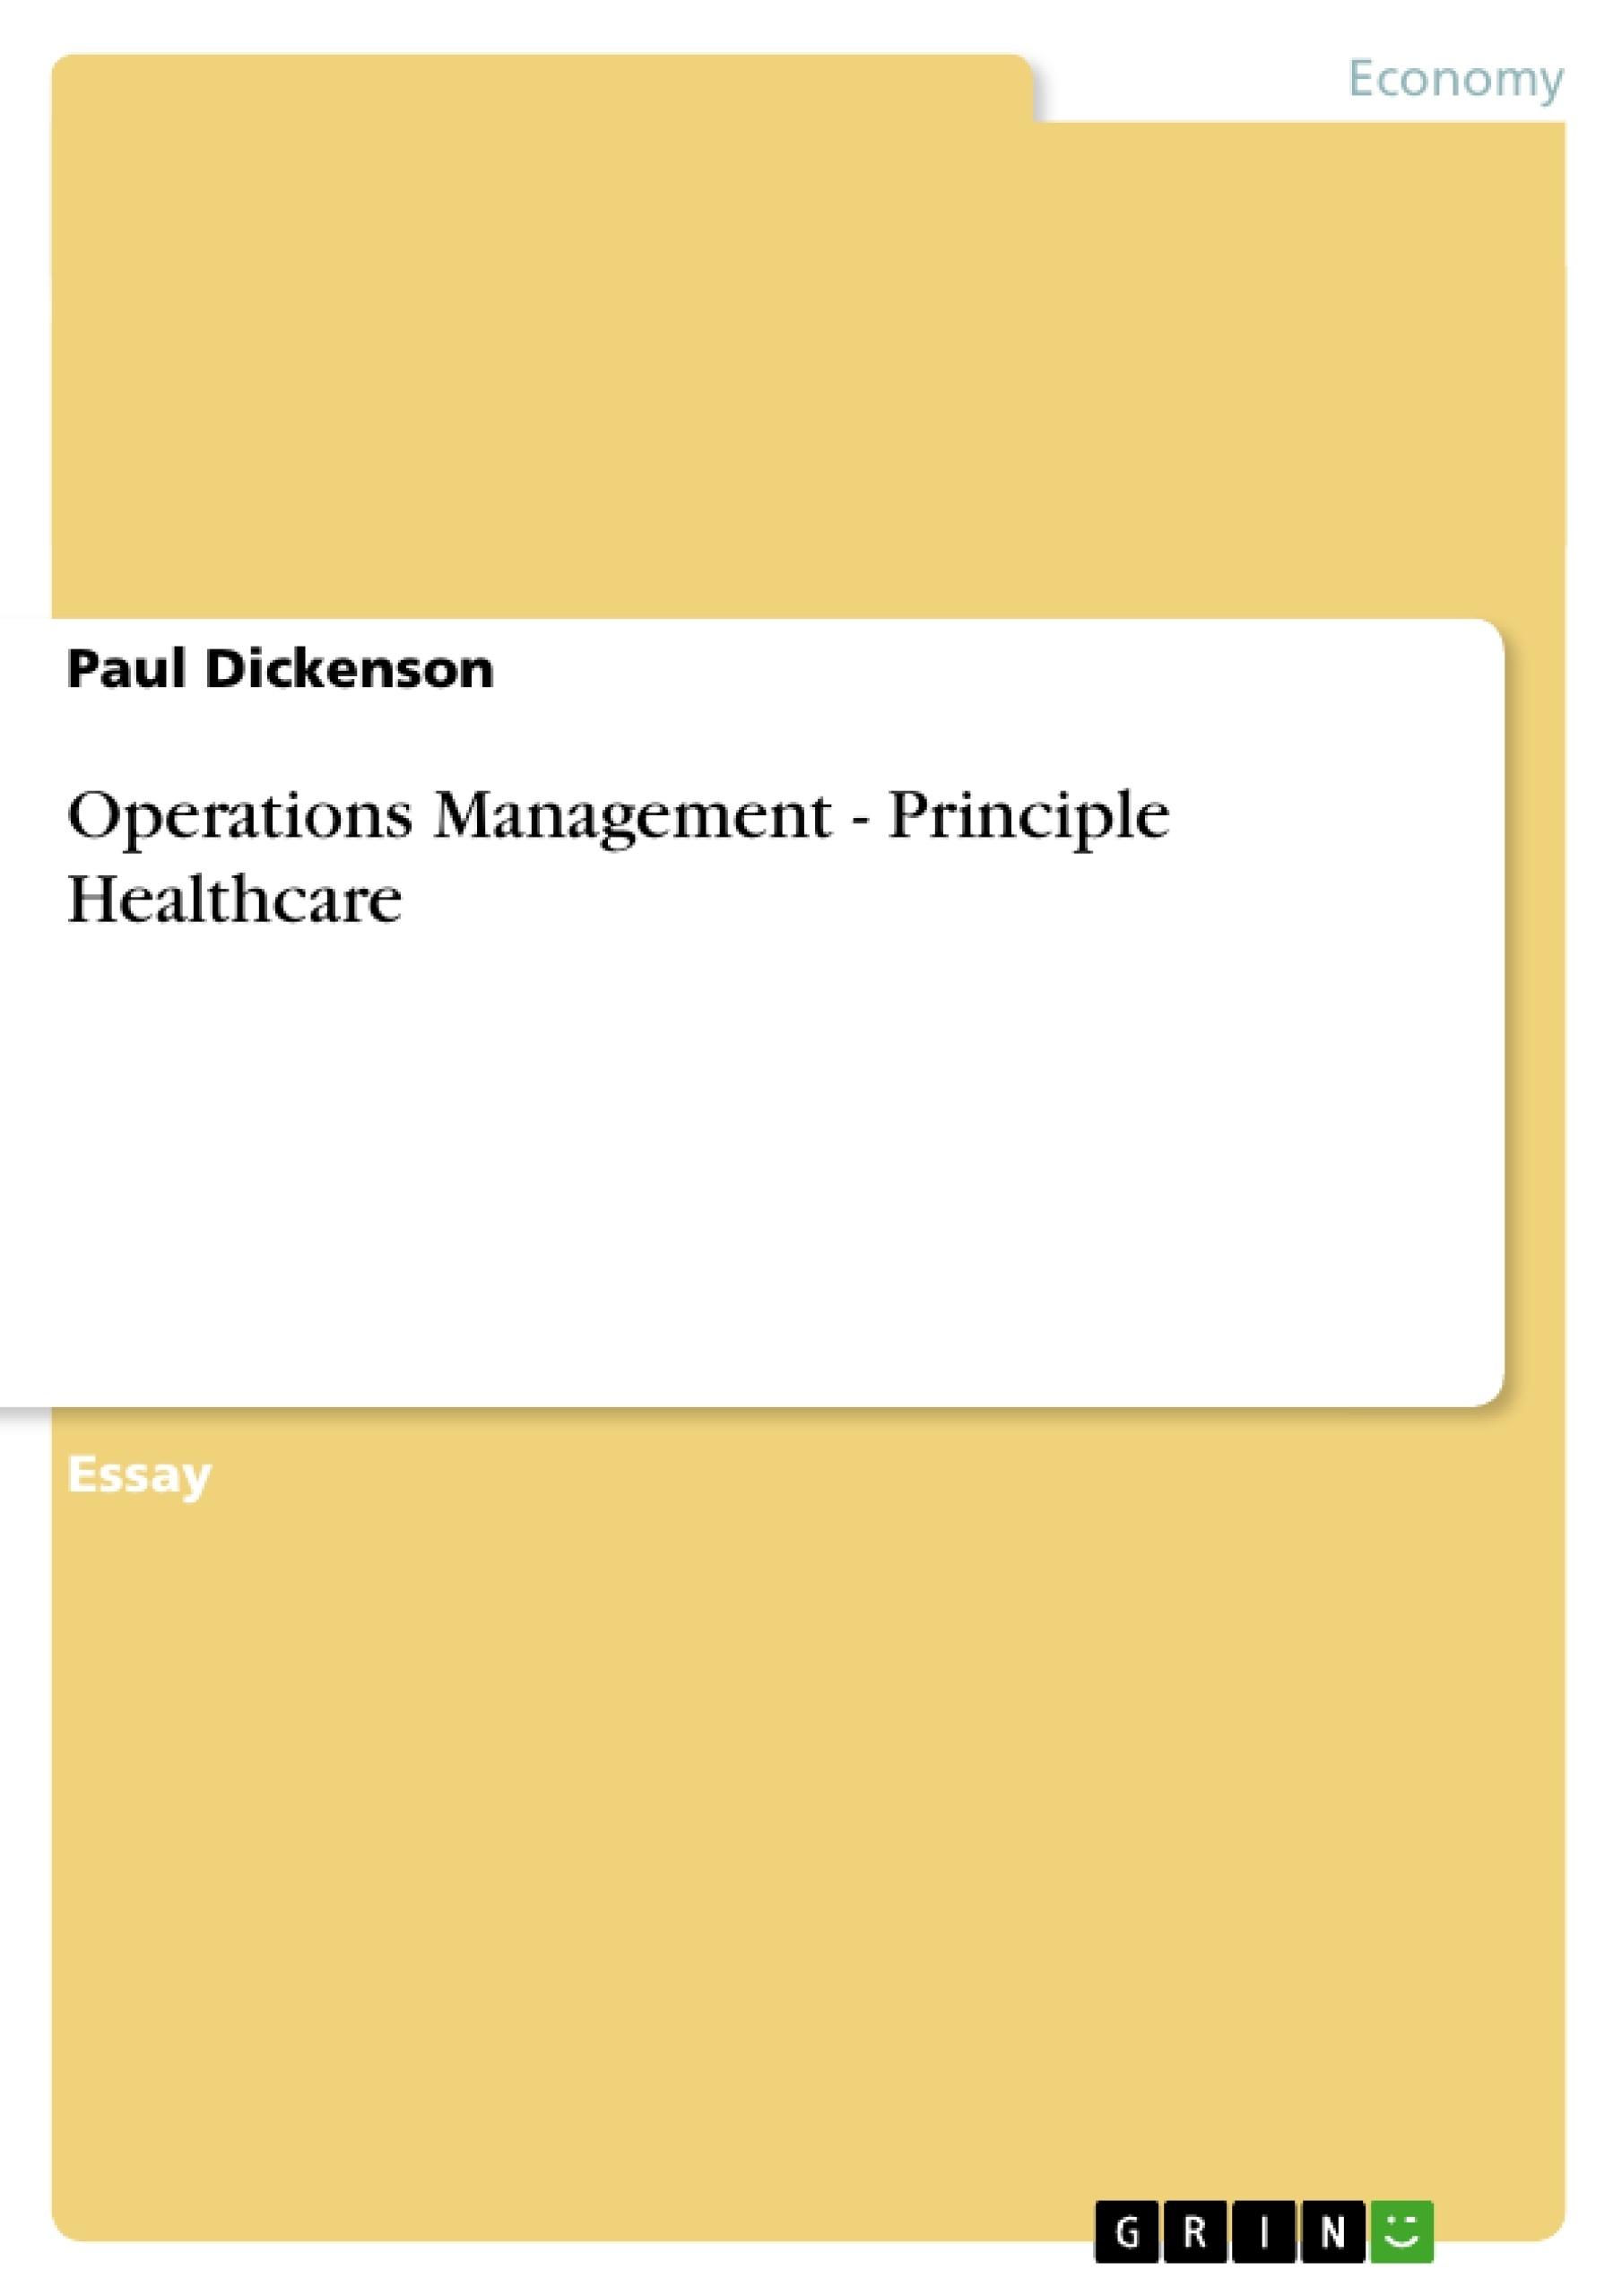 Title: Operations Management - Principle Healthcare